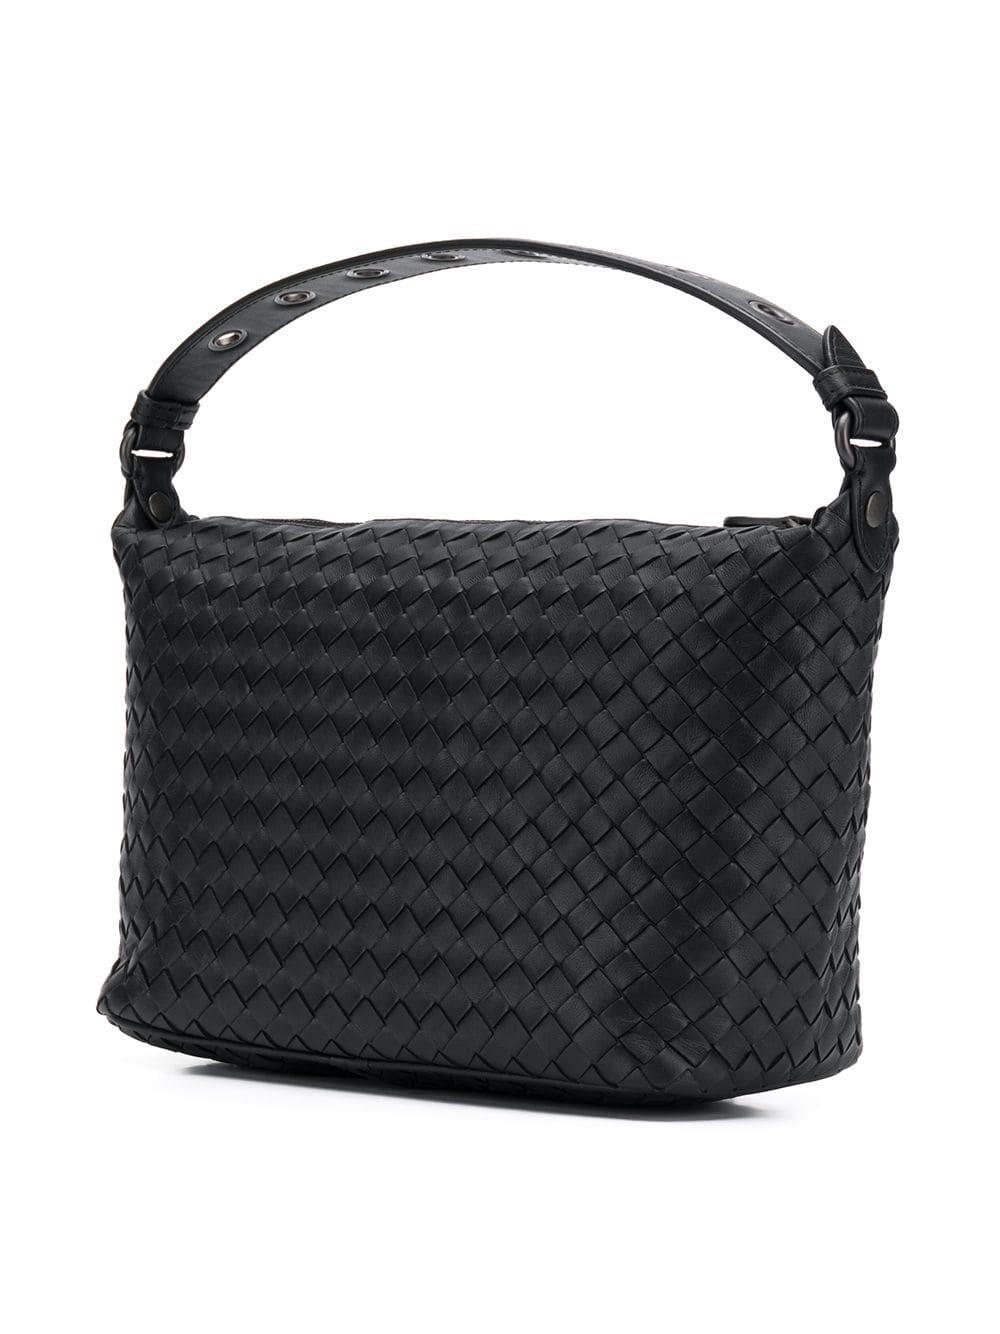 bottega veneta SHOULDER BAG available on montiboutique.com - 25881 5d57673ae6701